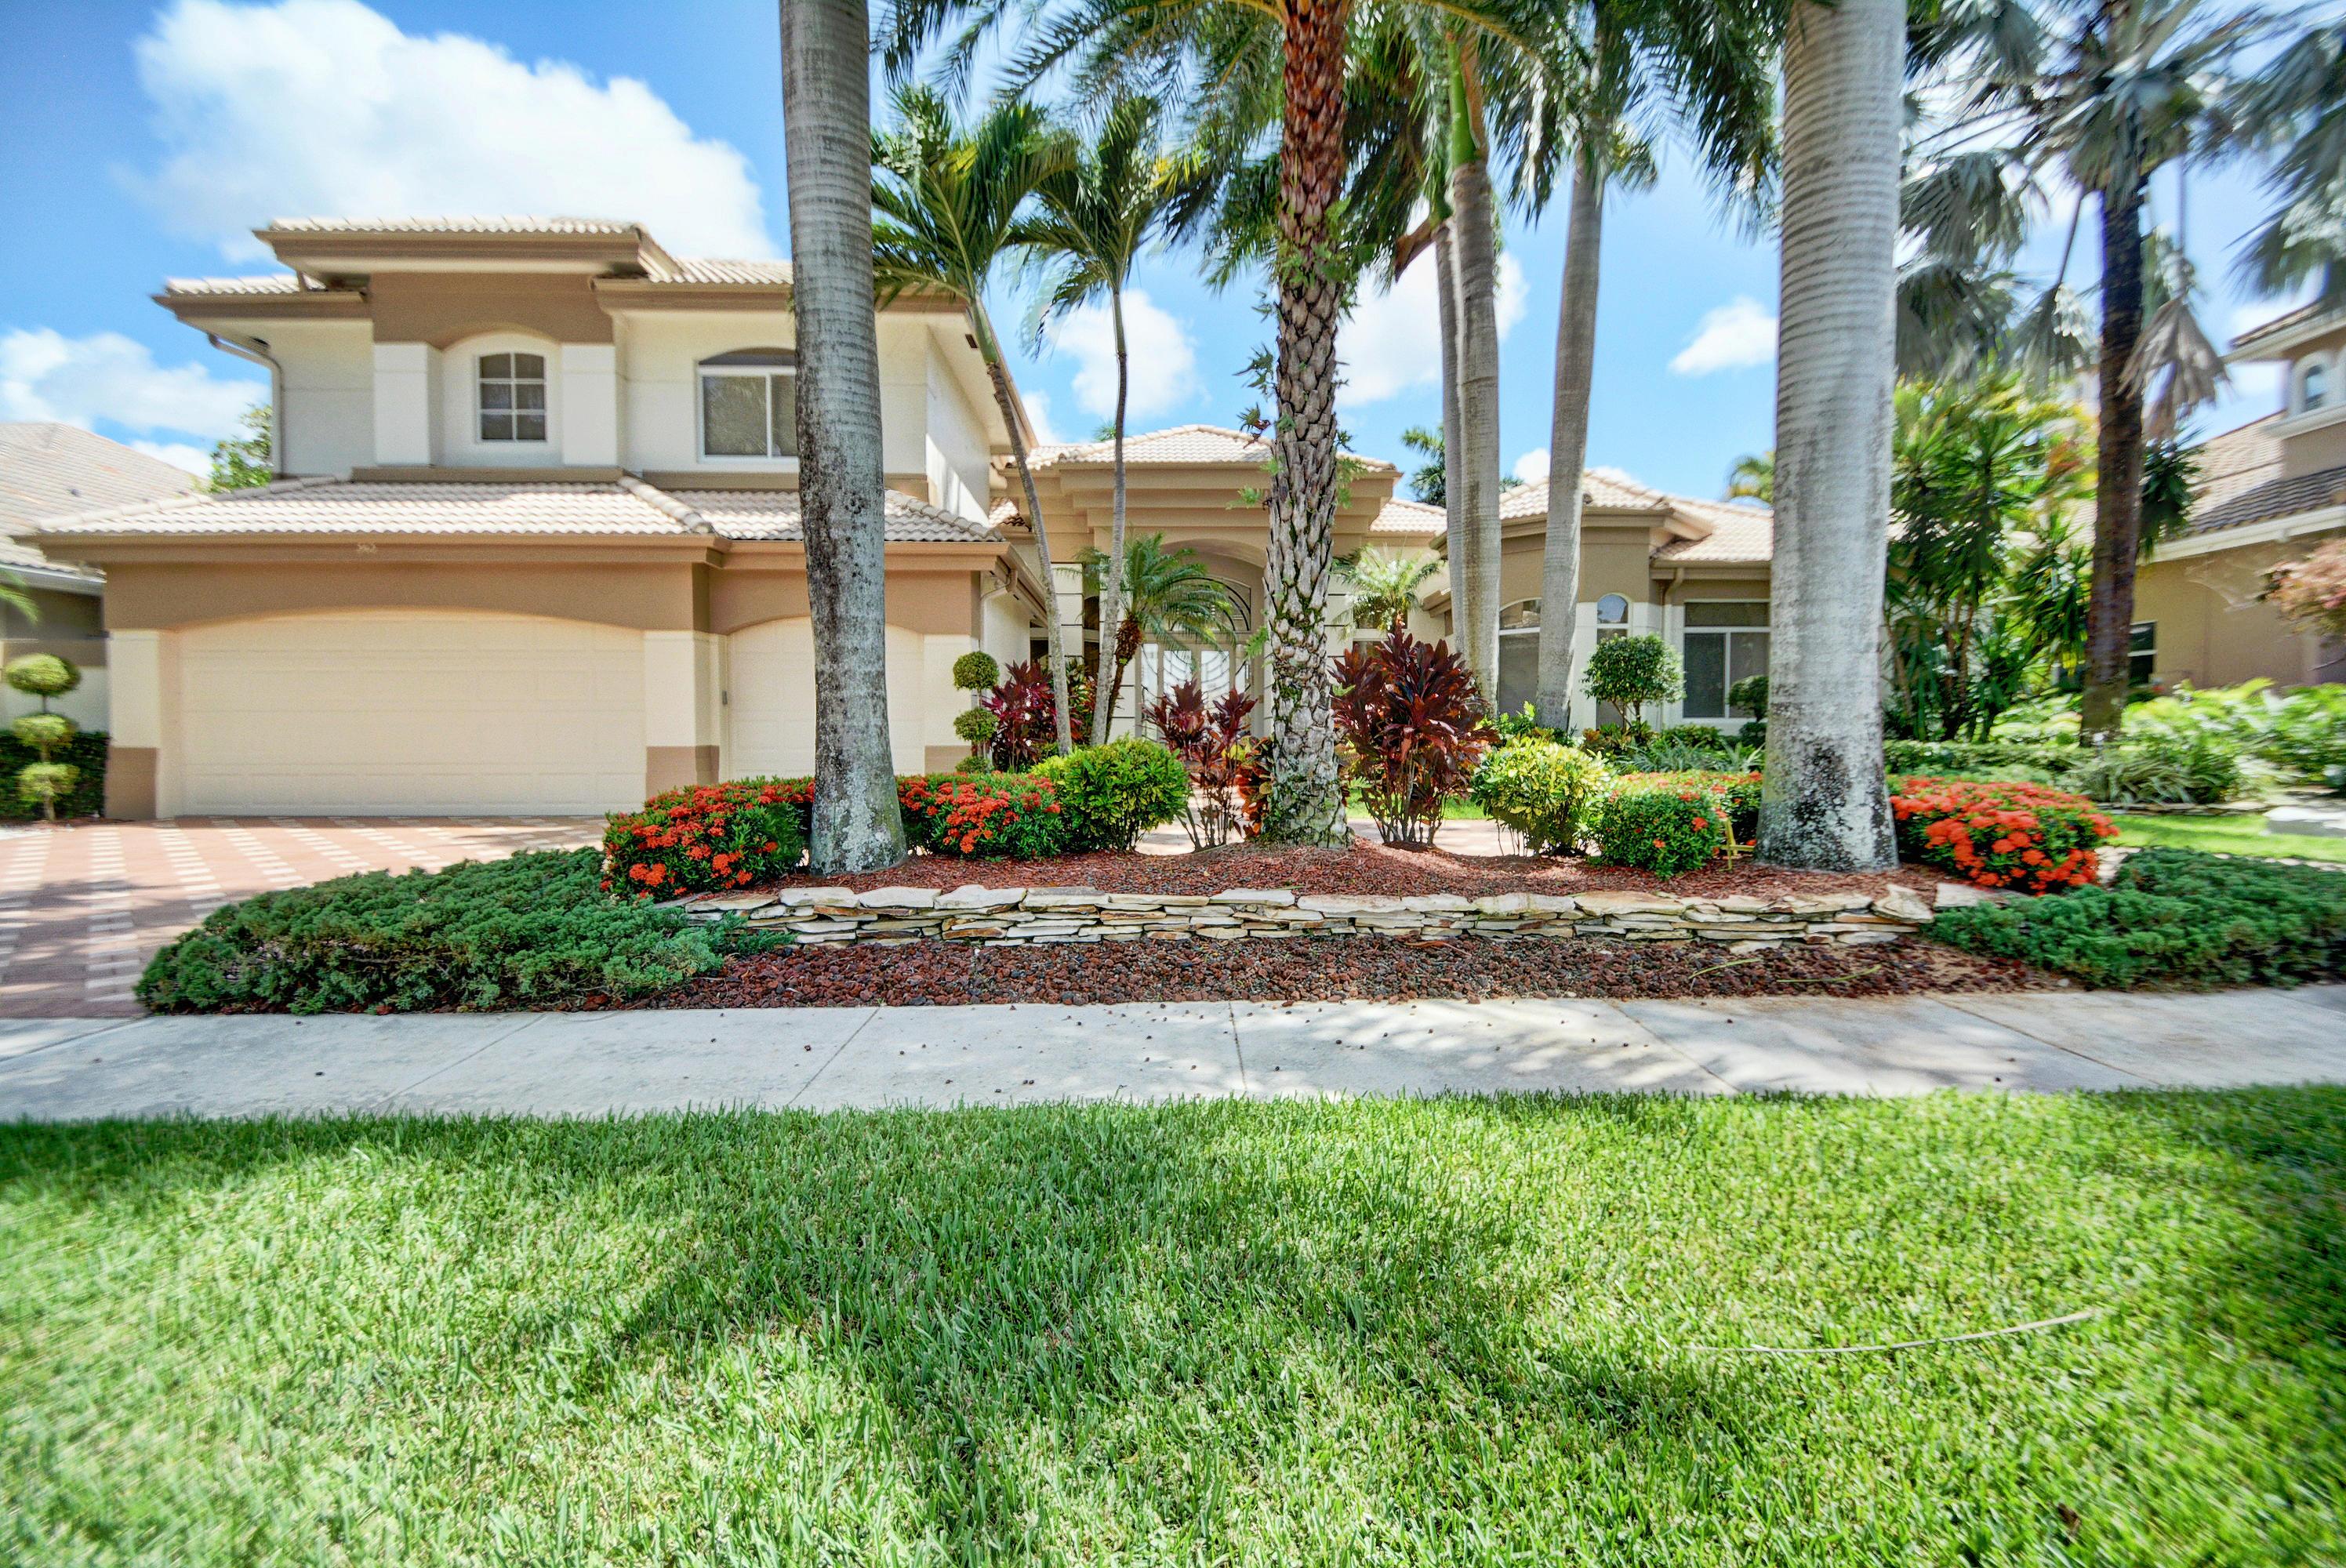 3415 Windsor Place Boca Raton, FL 33496 RX-10251941